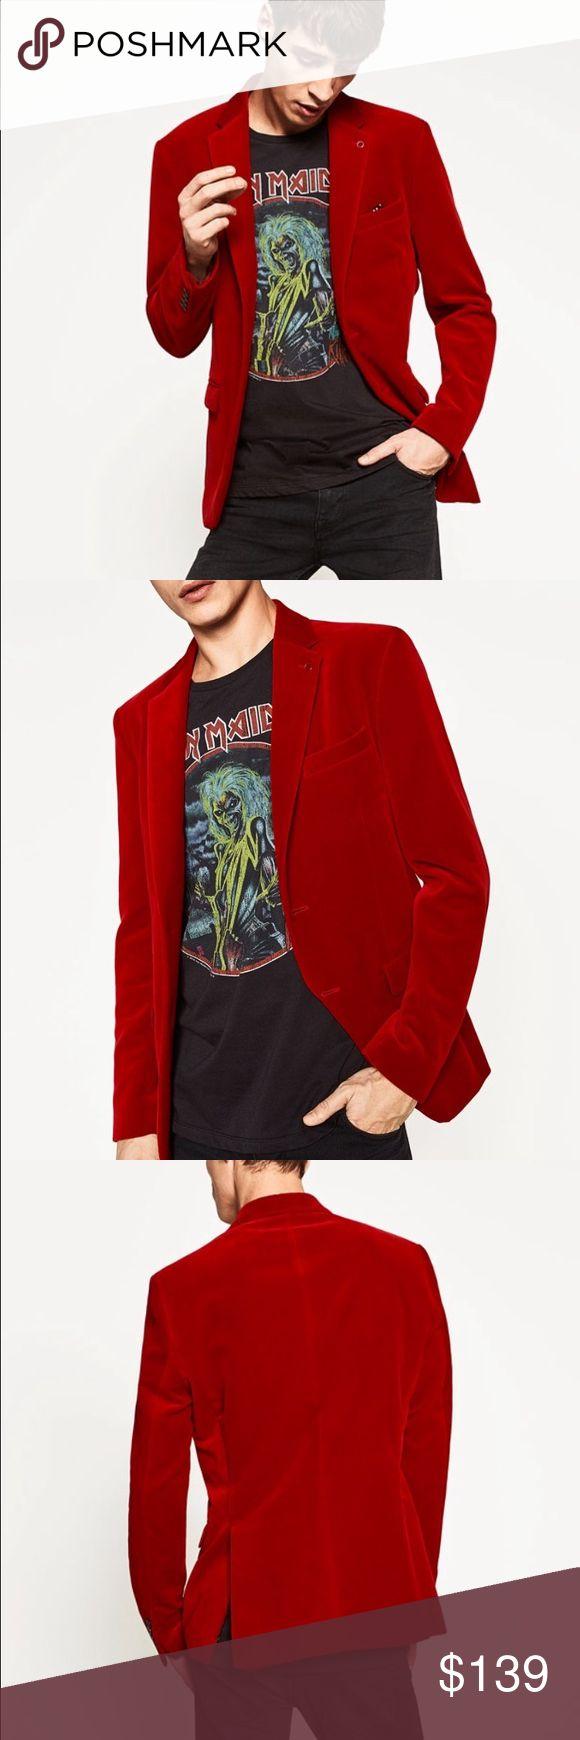 Zara men's velvet blazer Zara men's velvet blazer, perfect for NYE parties Zara Jackets & Coats